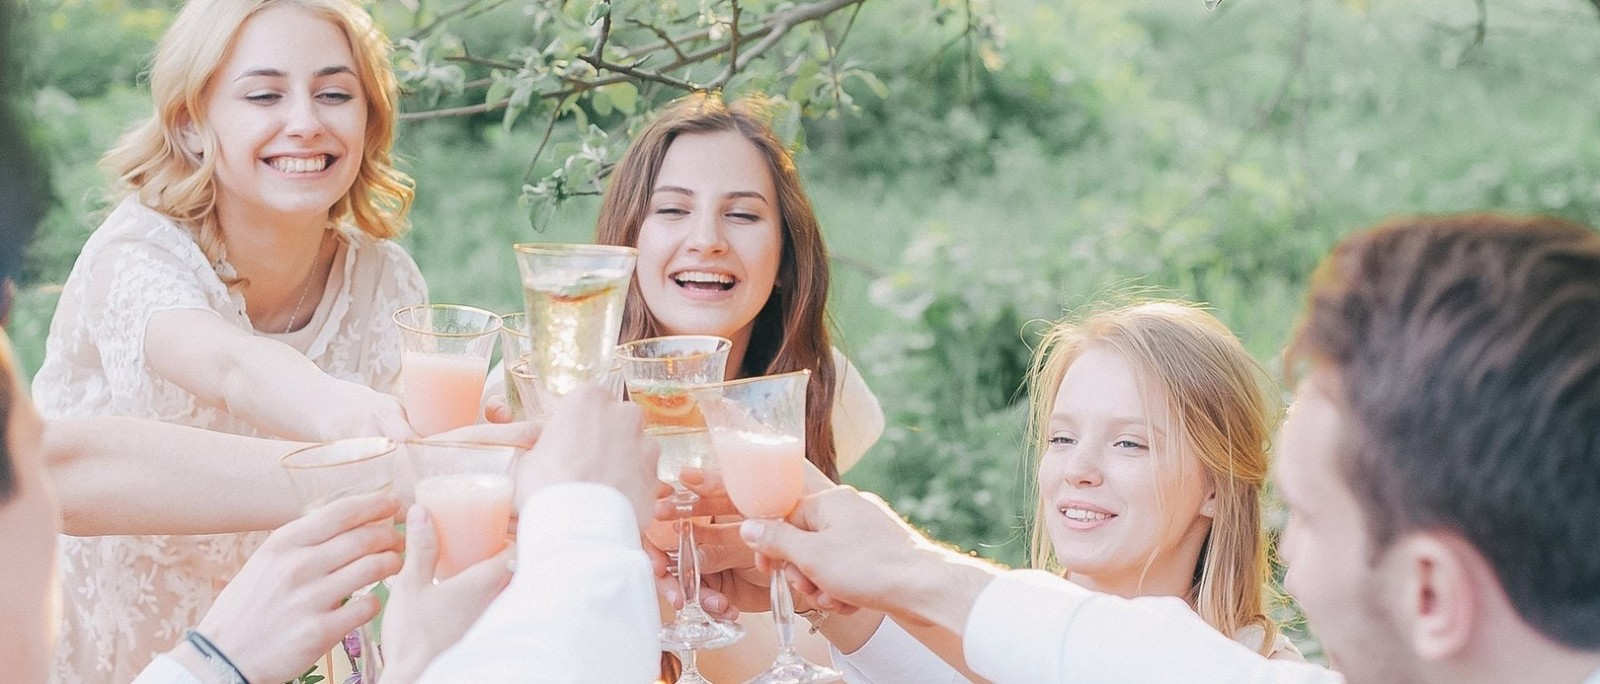 Bon Vivants Wine Club